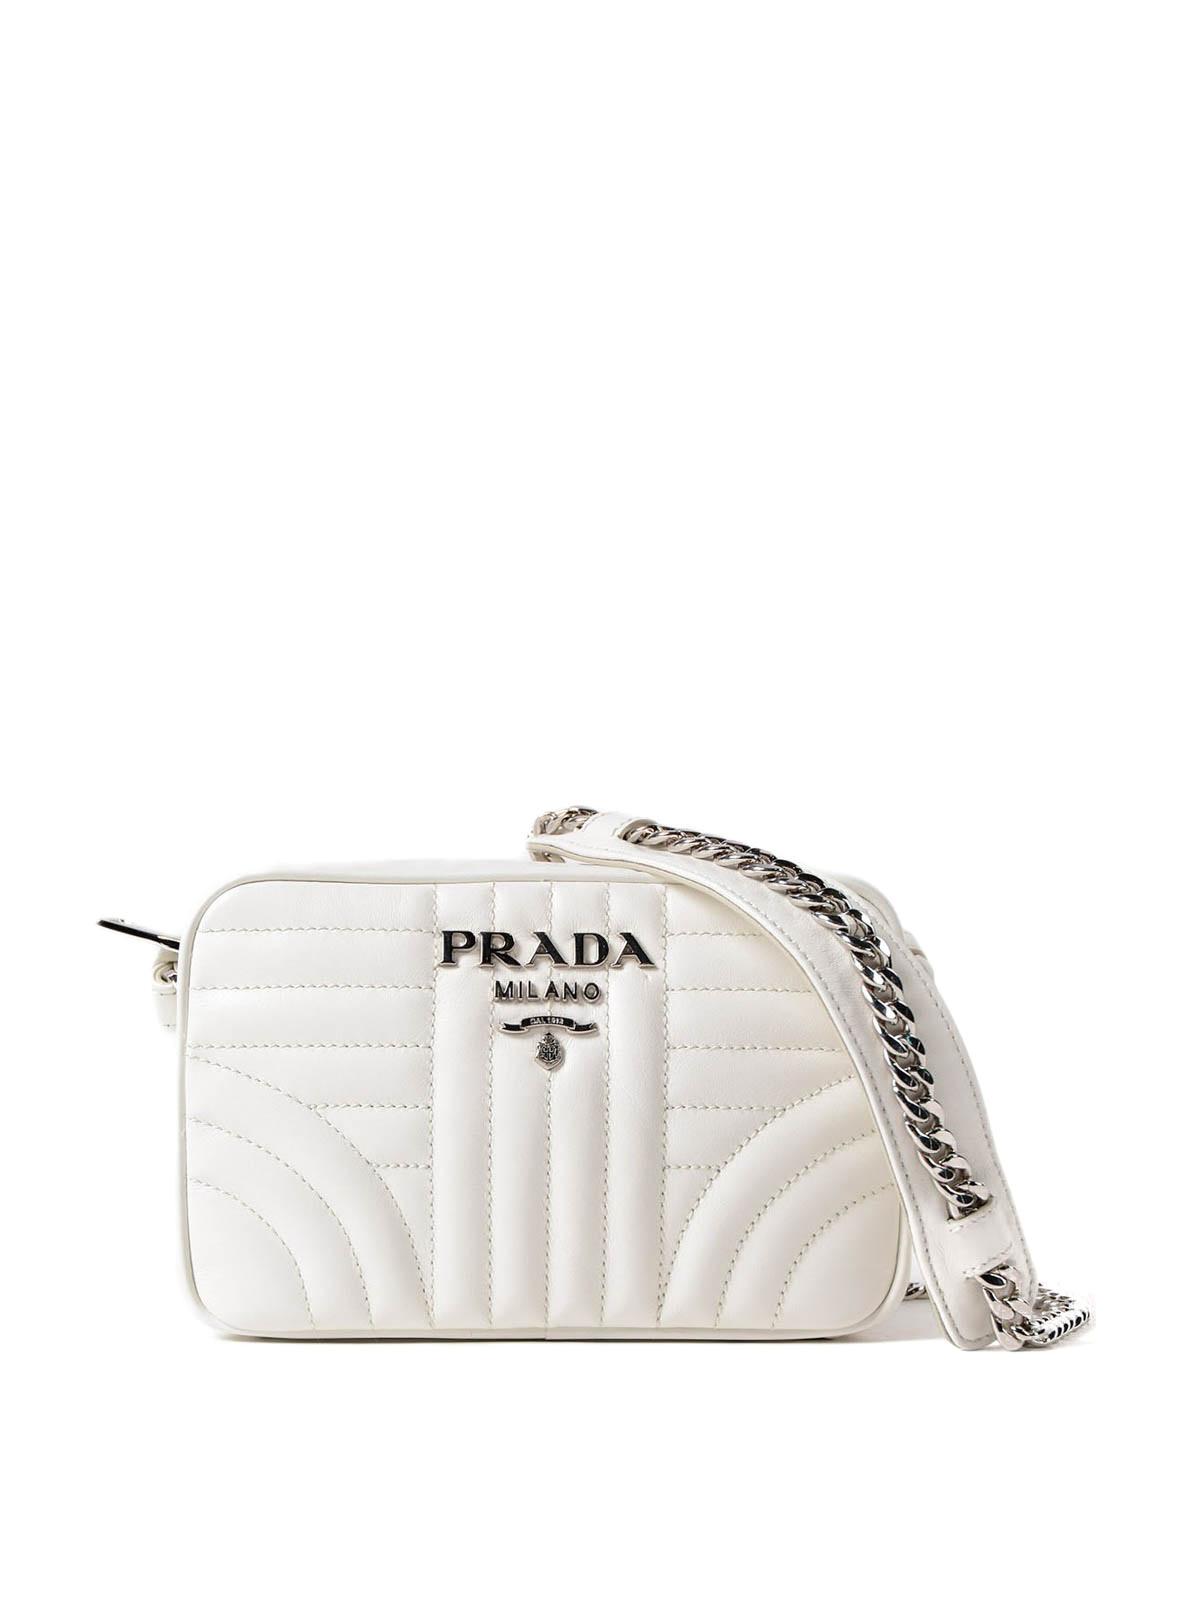 406932ef7f0d Prada - Diagramme soft white crossbody - cross body bags ...